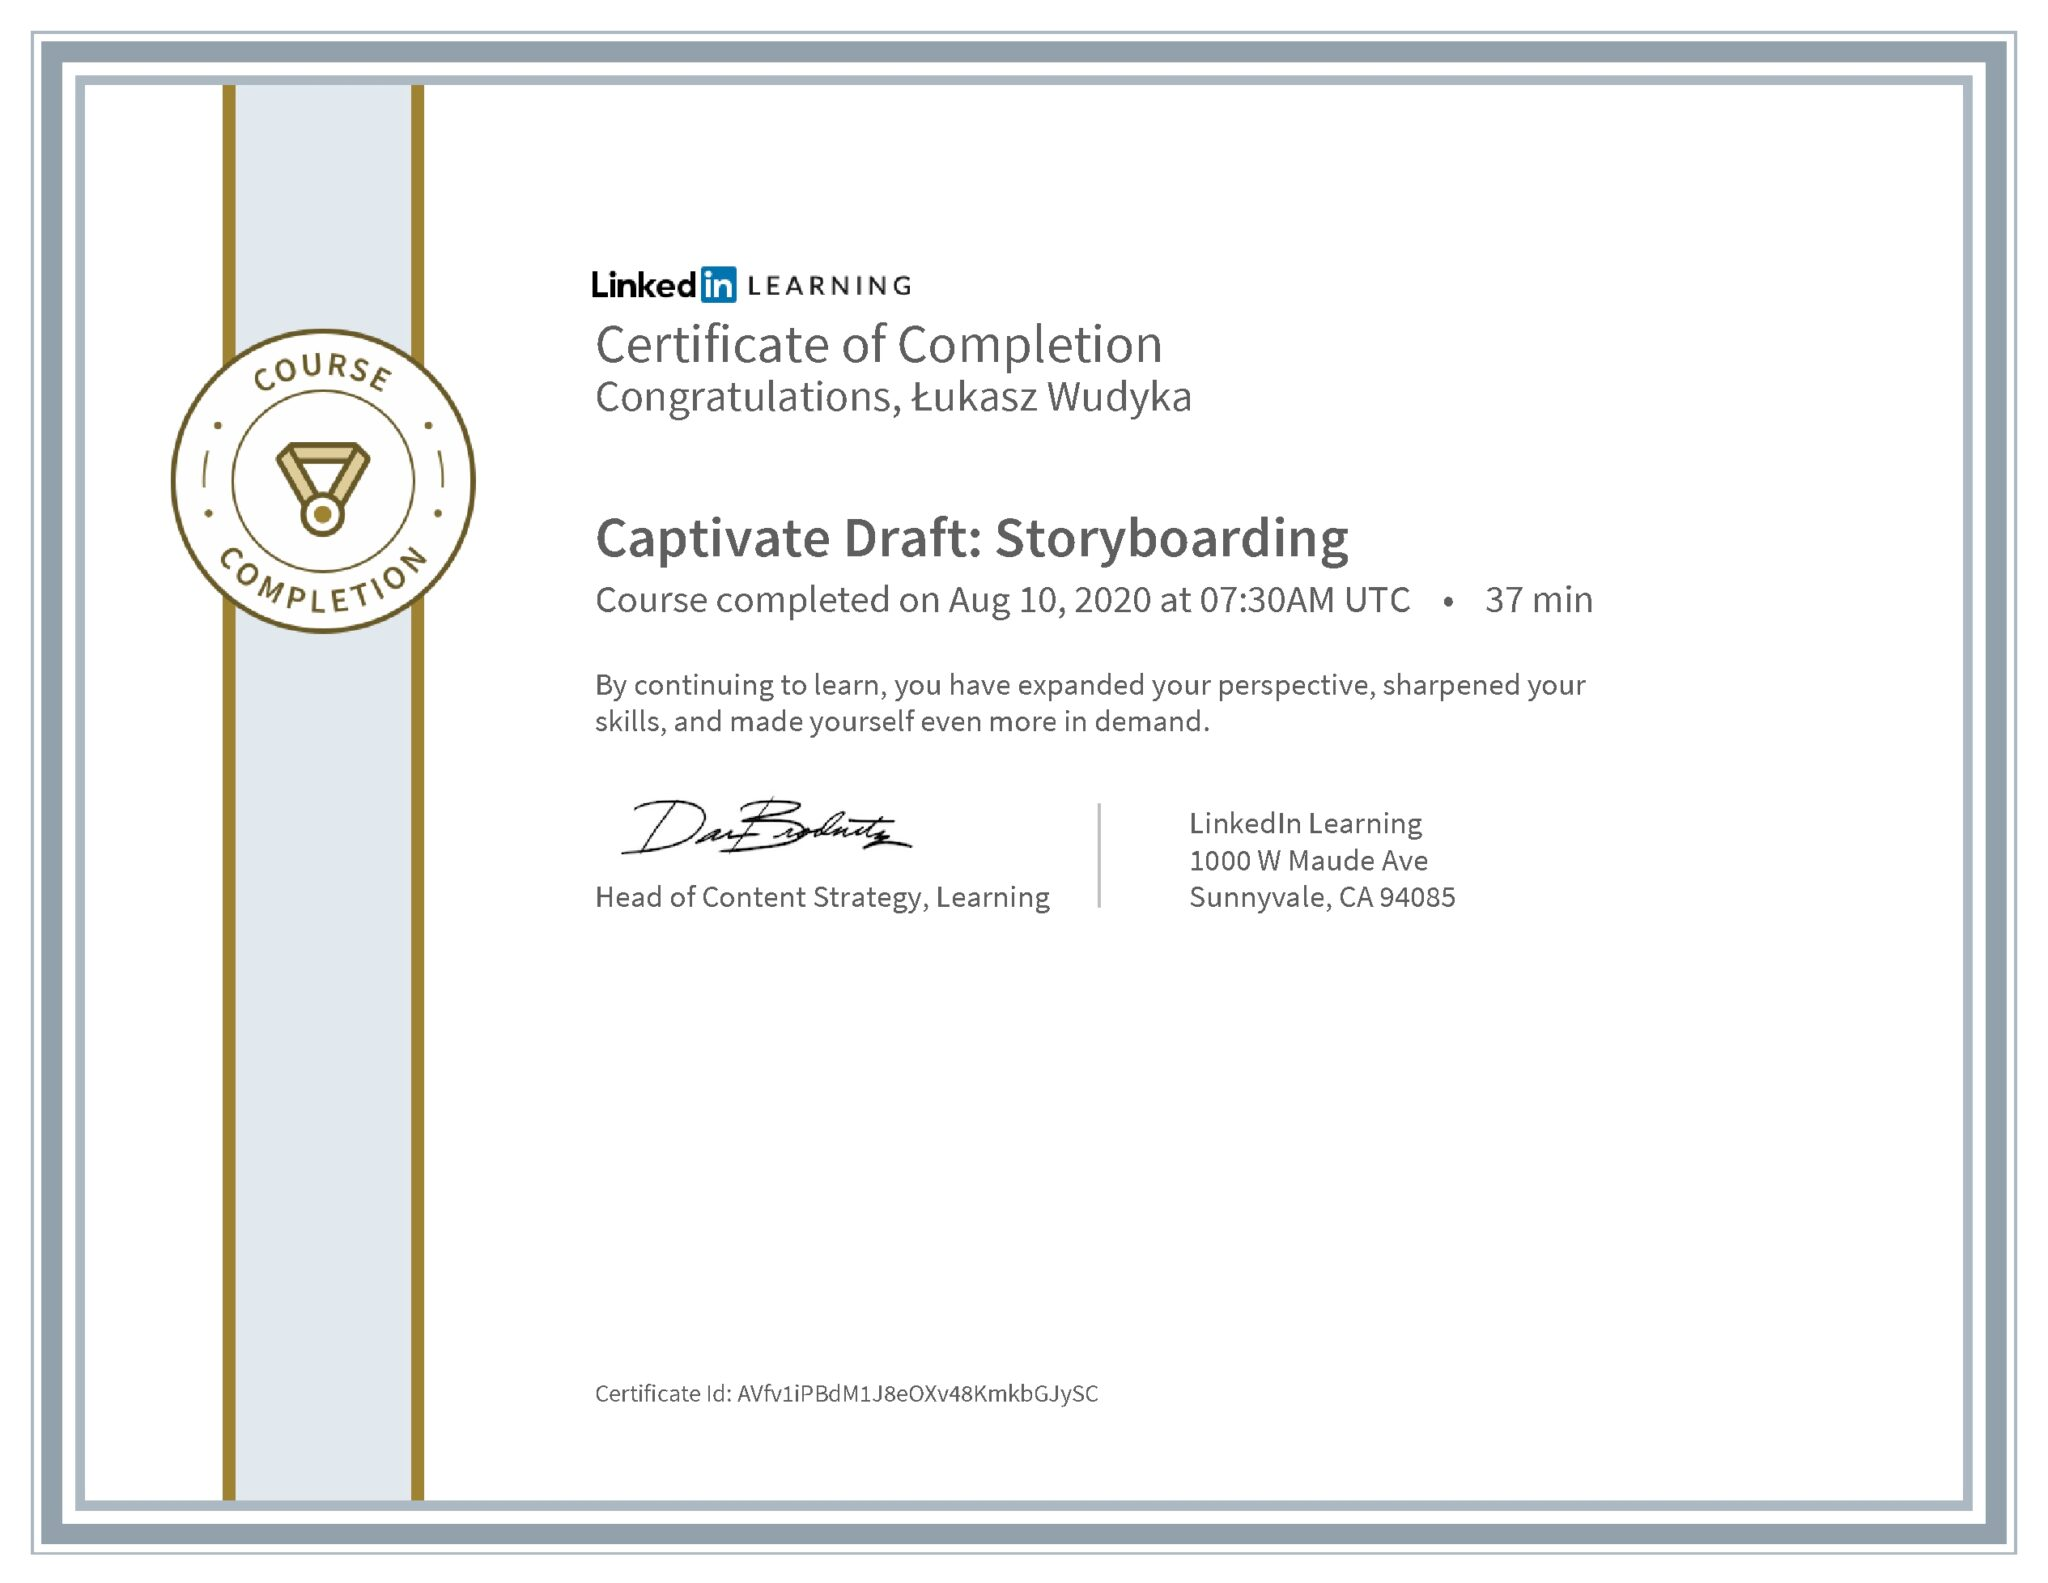 Łukasz Wudyka certyfikat LinkedIn Captivate Draft: Storyboarding